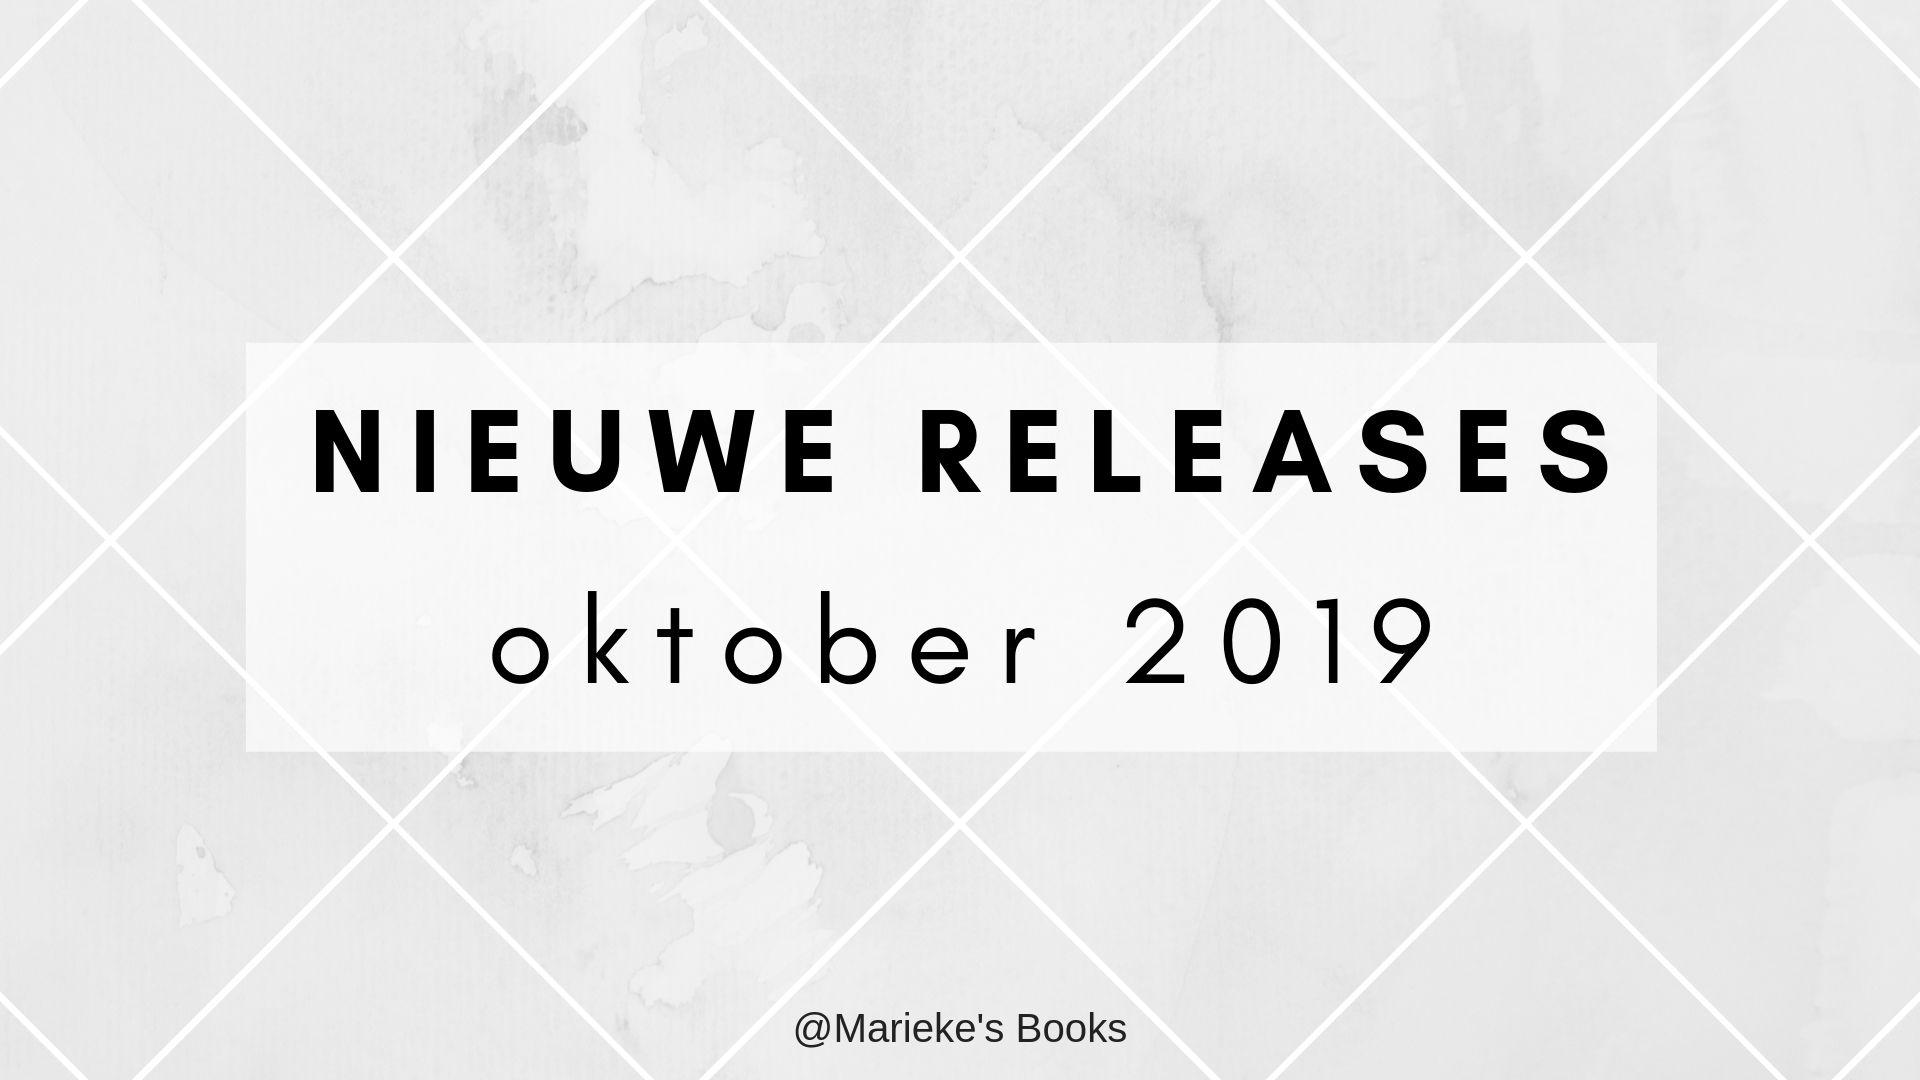 Nieuwe releases oktober 2019 | Marieke's Books